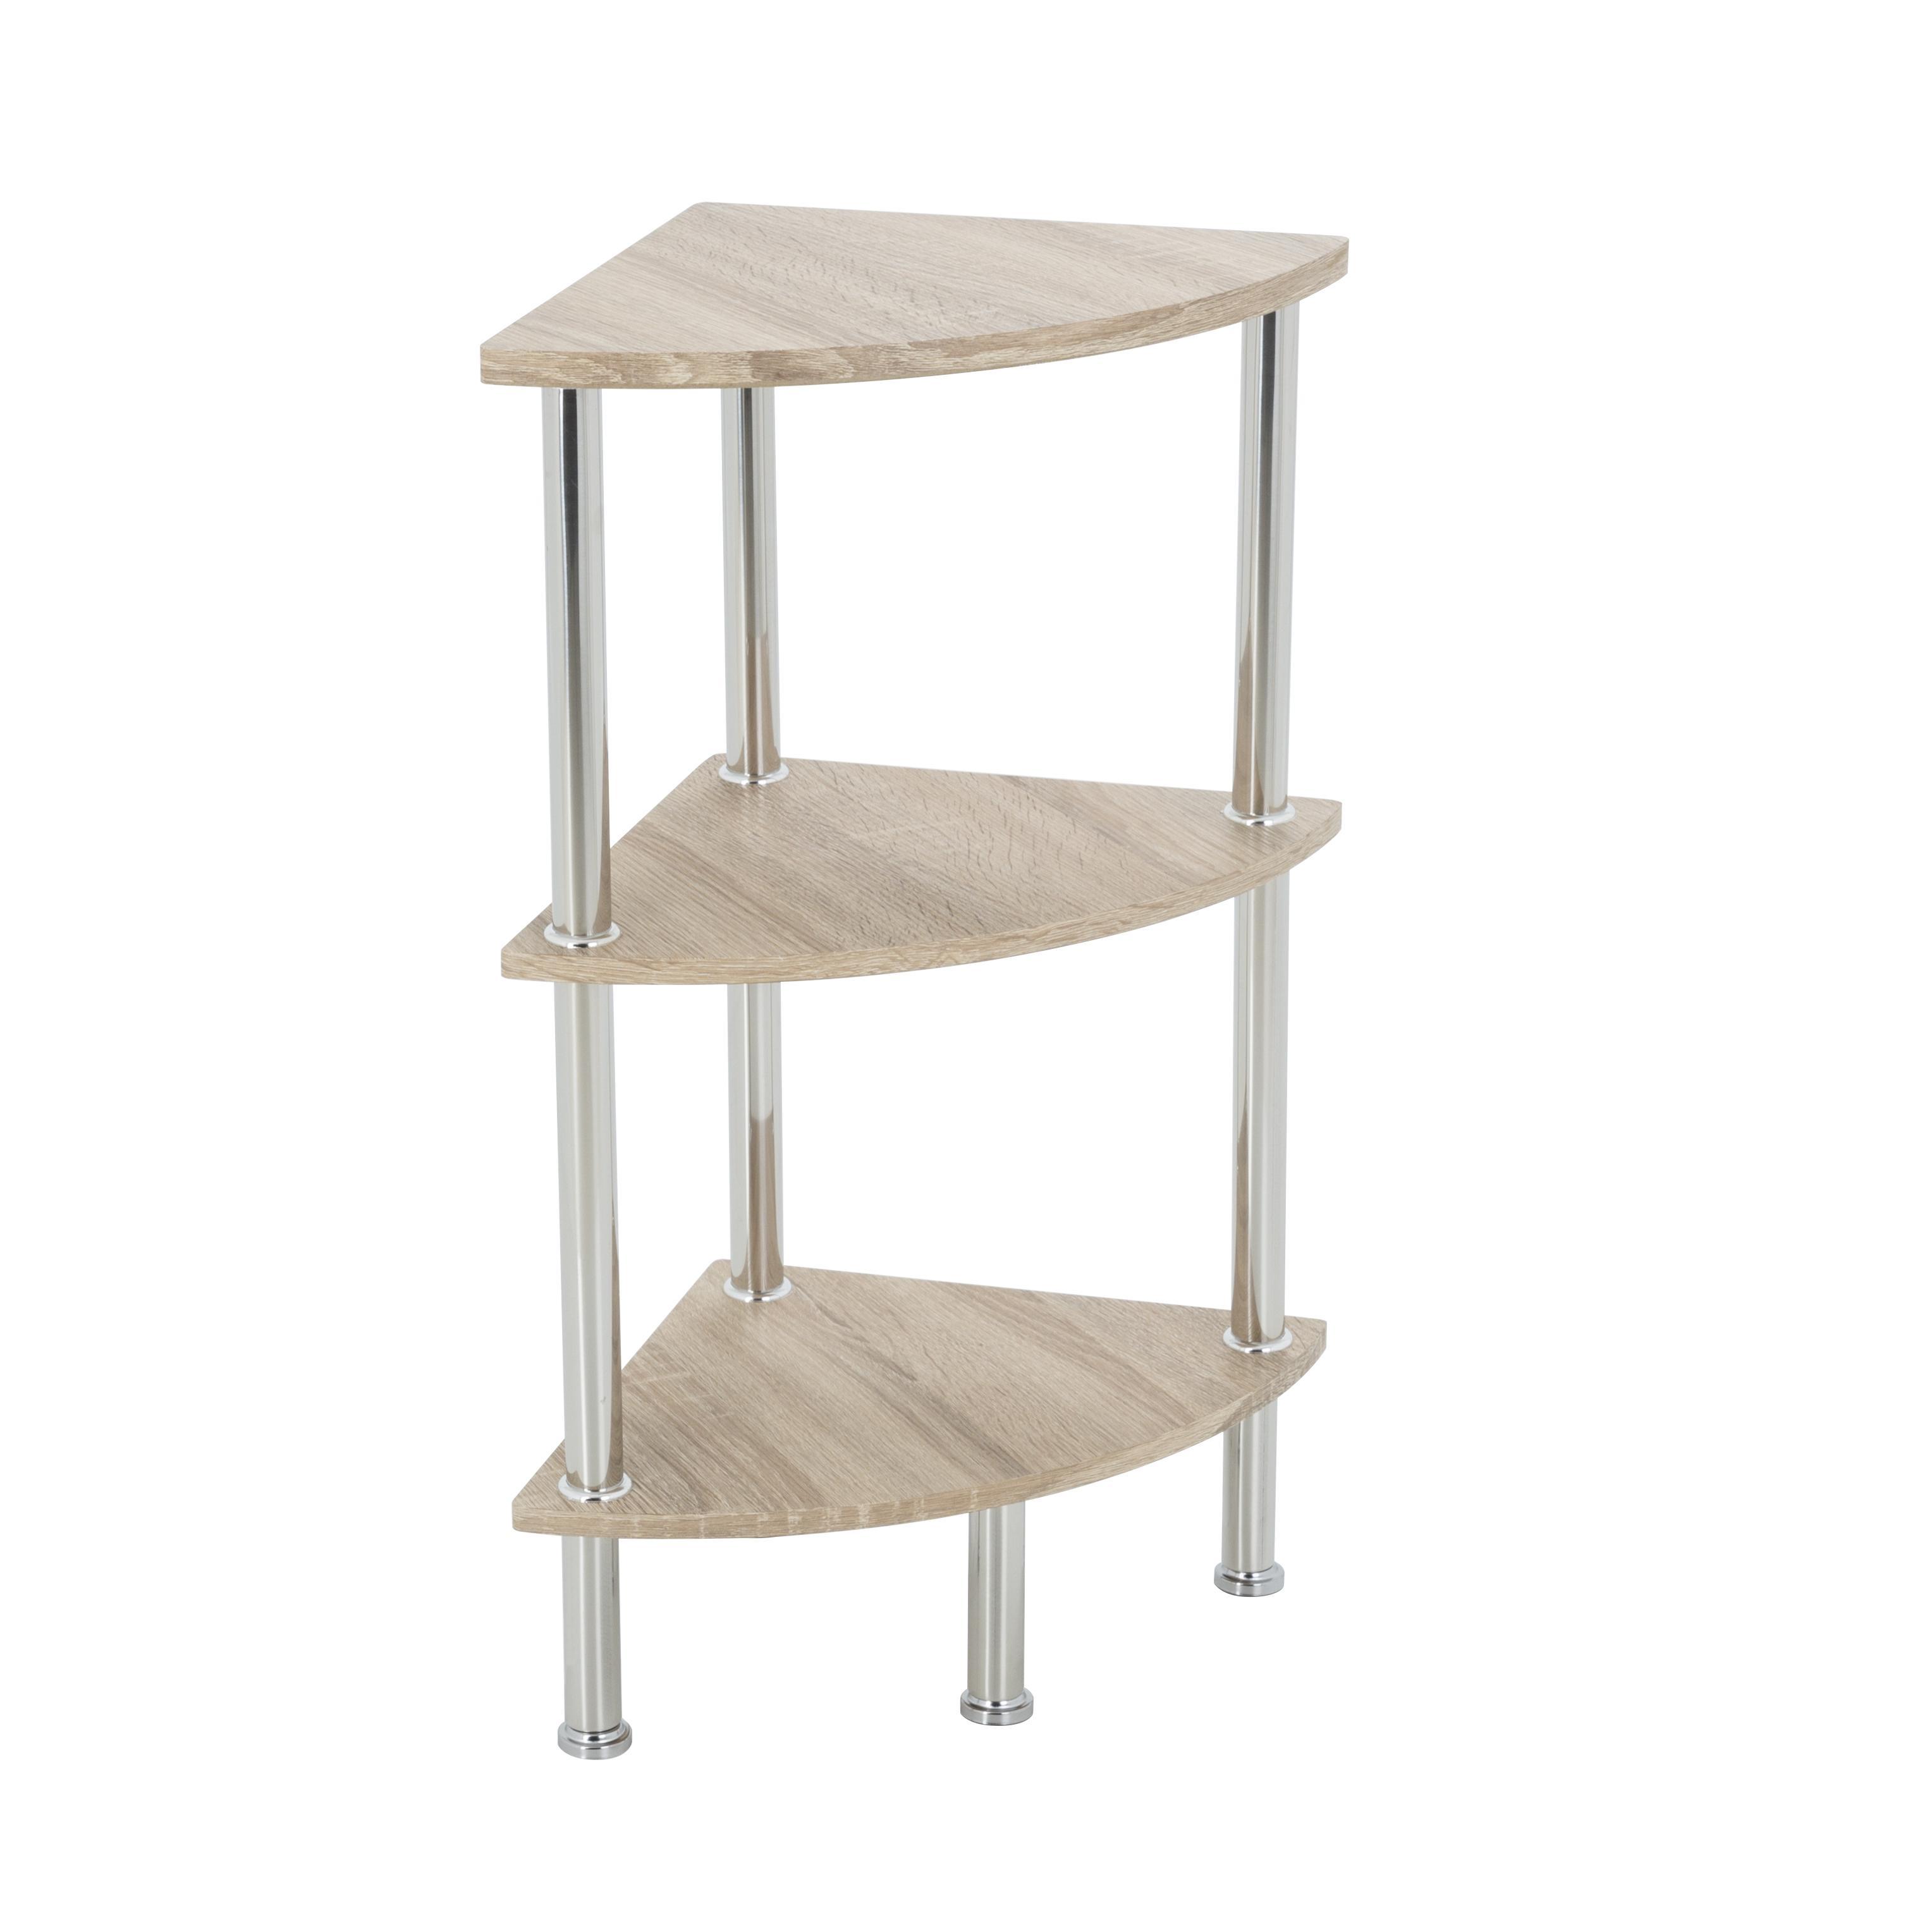 Avf s53ow a corner 3 tier shelving unit in for Avf furniture